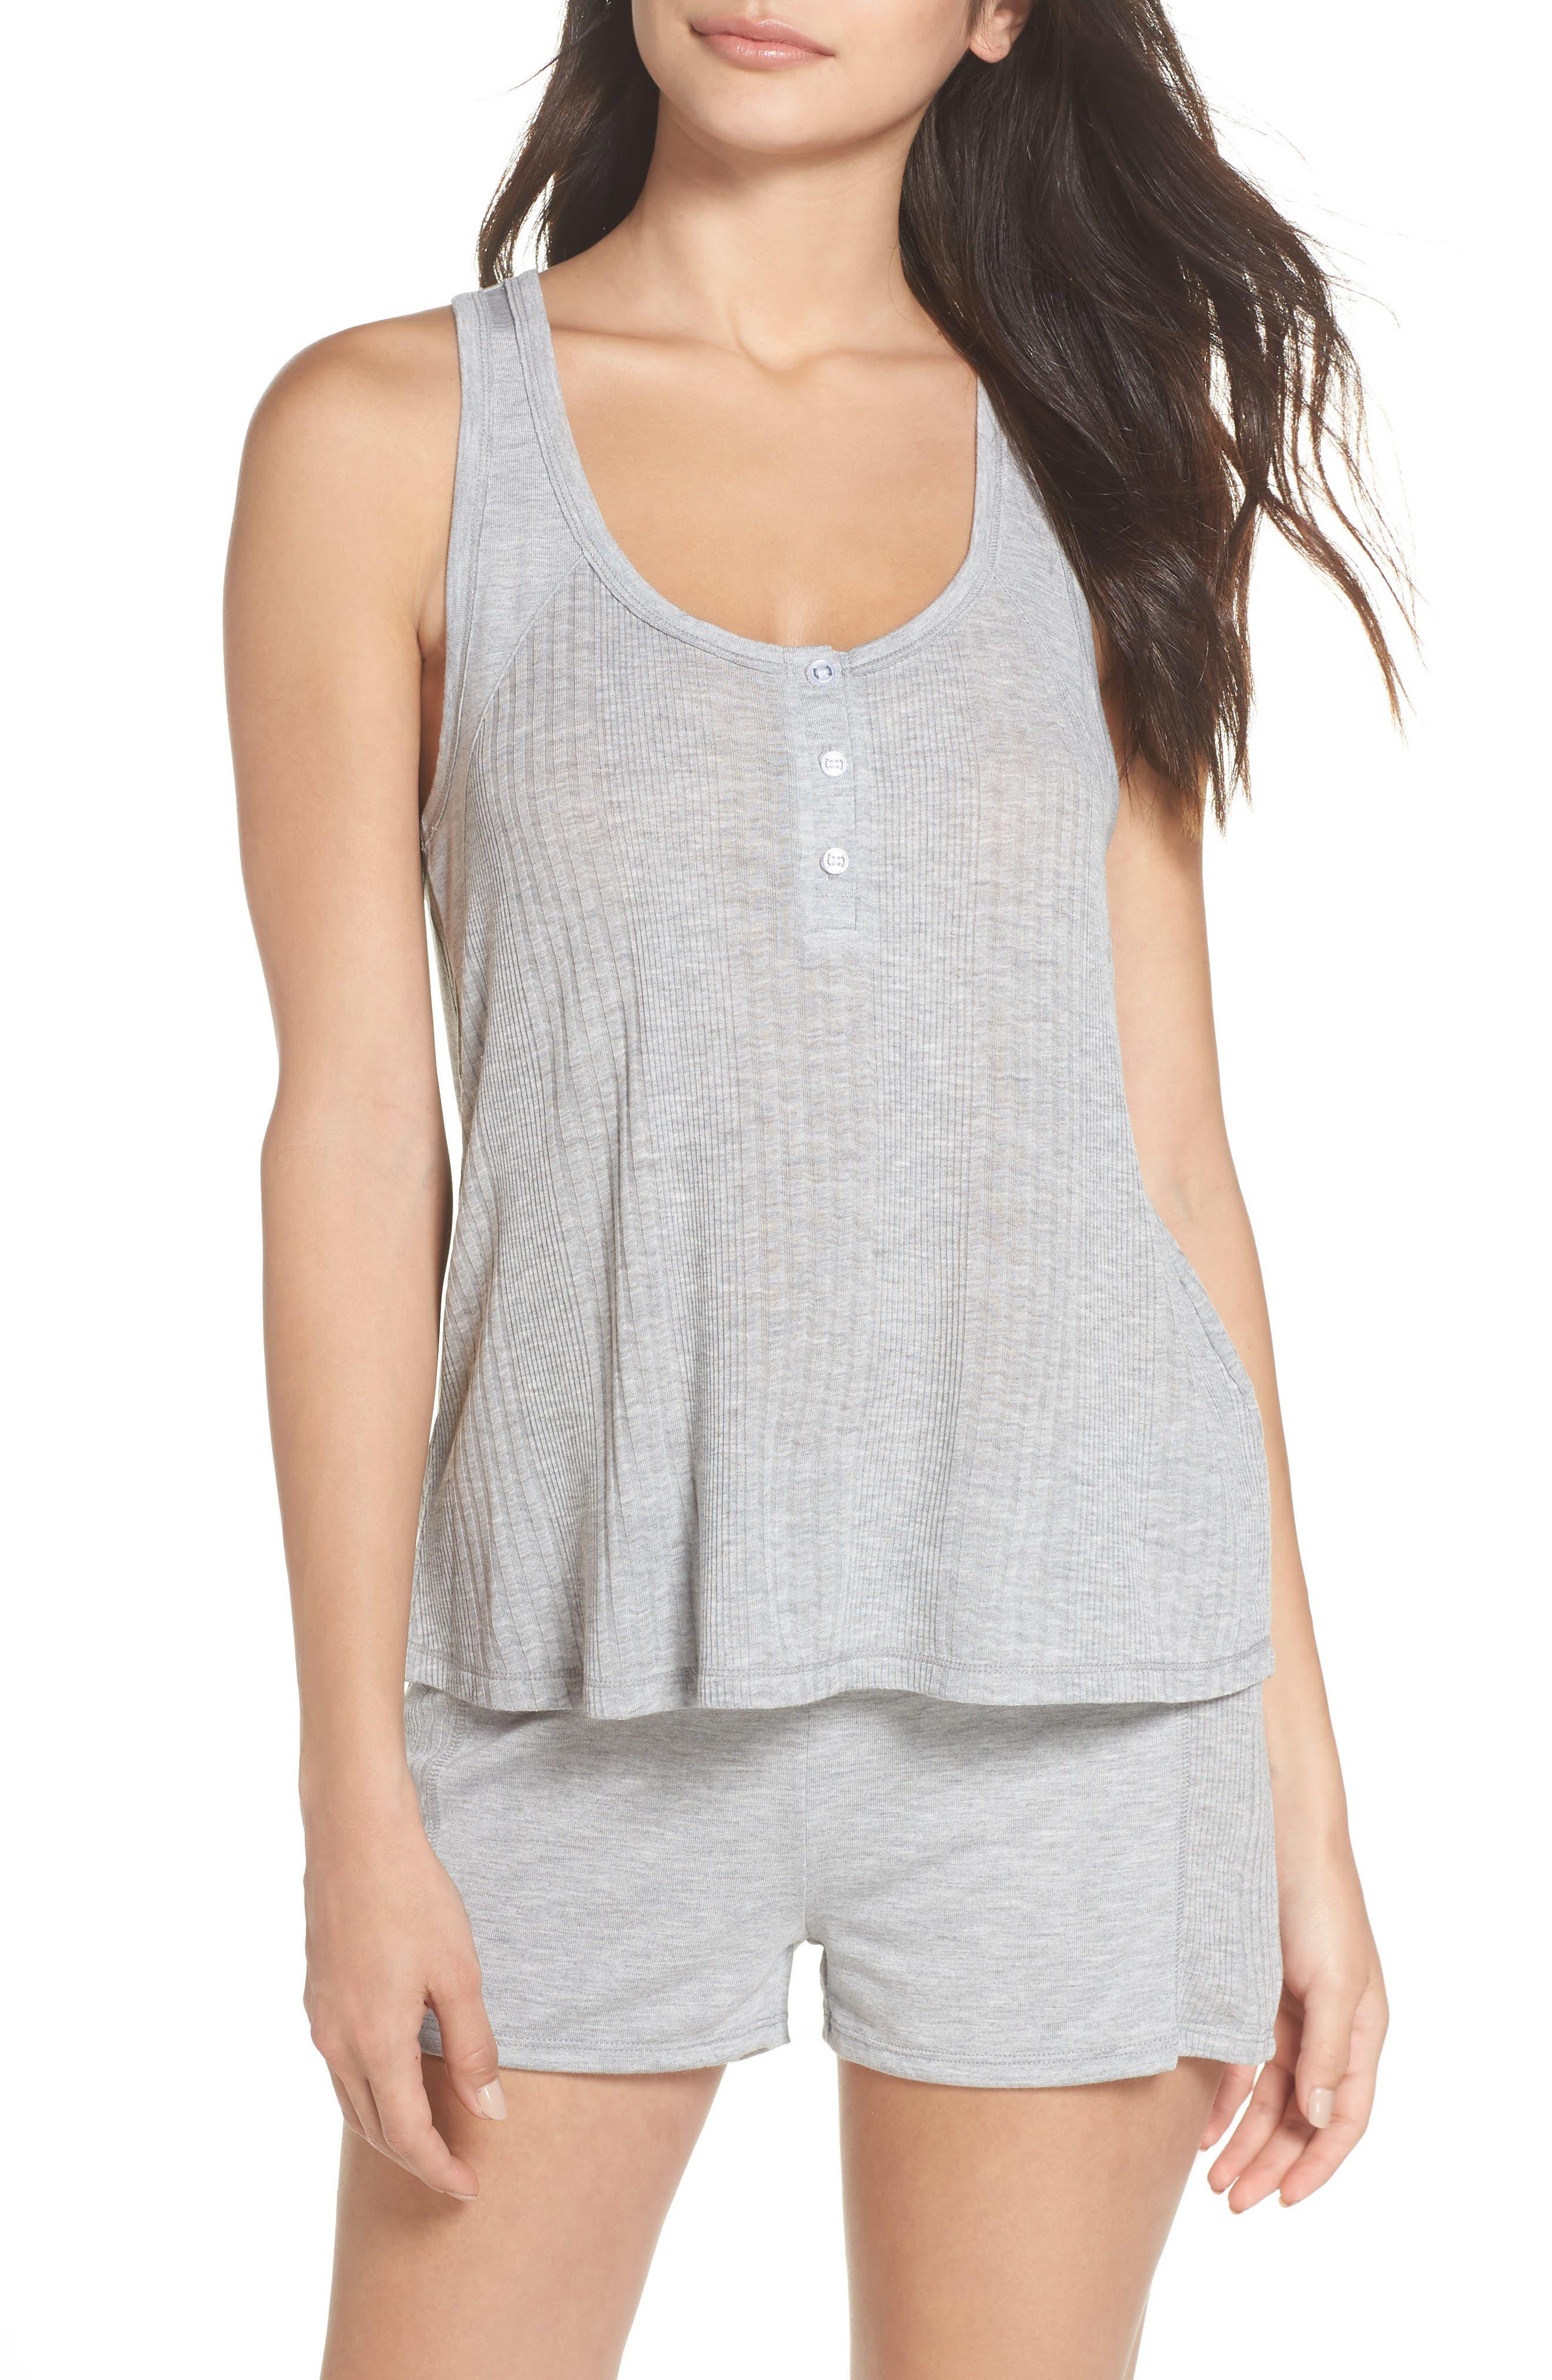 Pajama Shorts,                             Alternate thumbnail 7, color,                             LIGHT HEATHER GREY